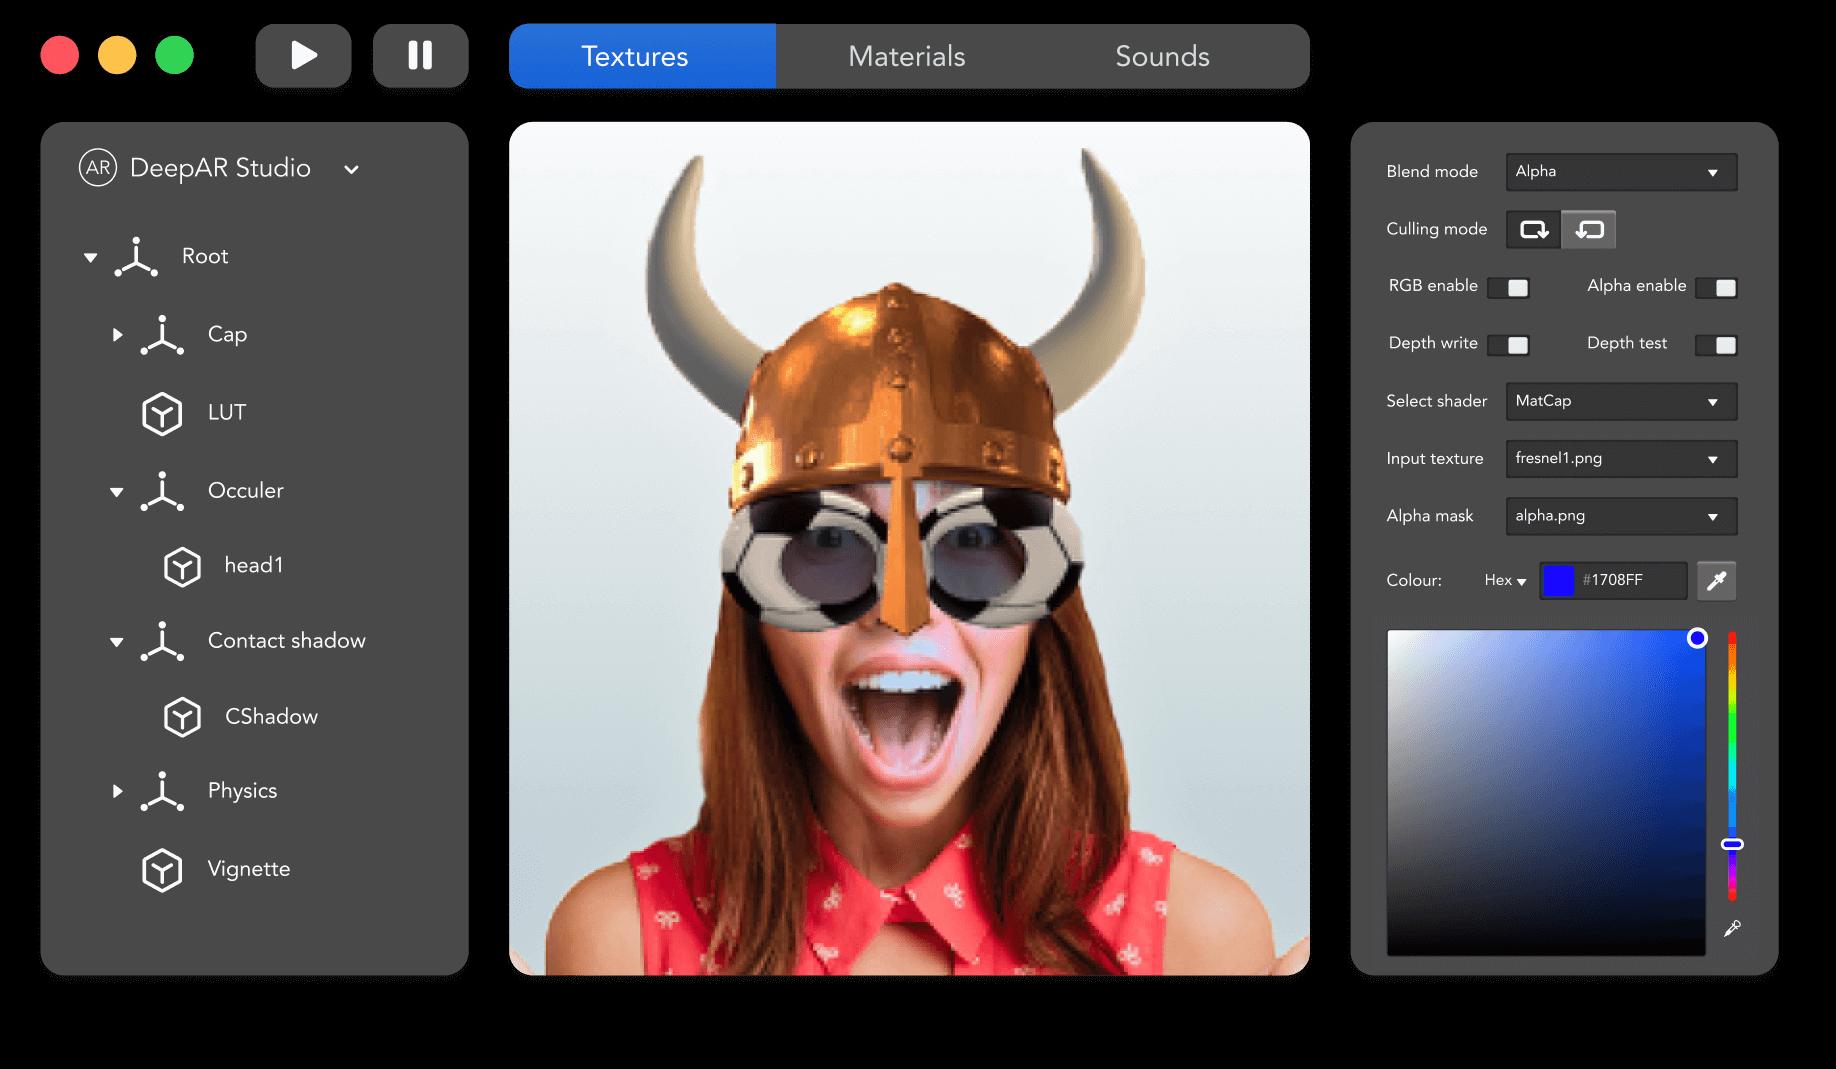 Mockup of our DeepAR Creator Studio desktop software editing a face filter of a viking hat + football glasses.